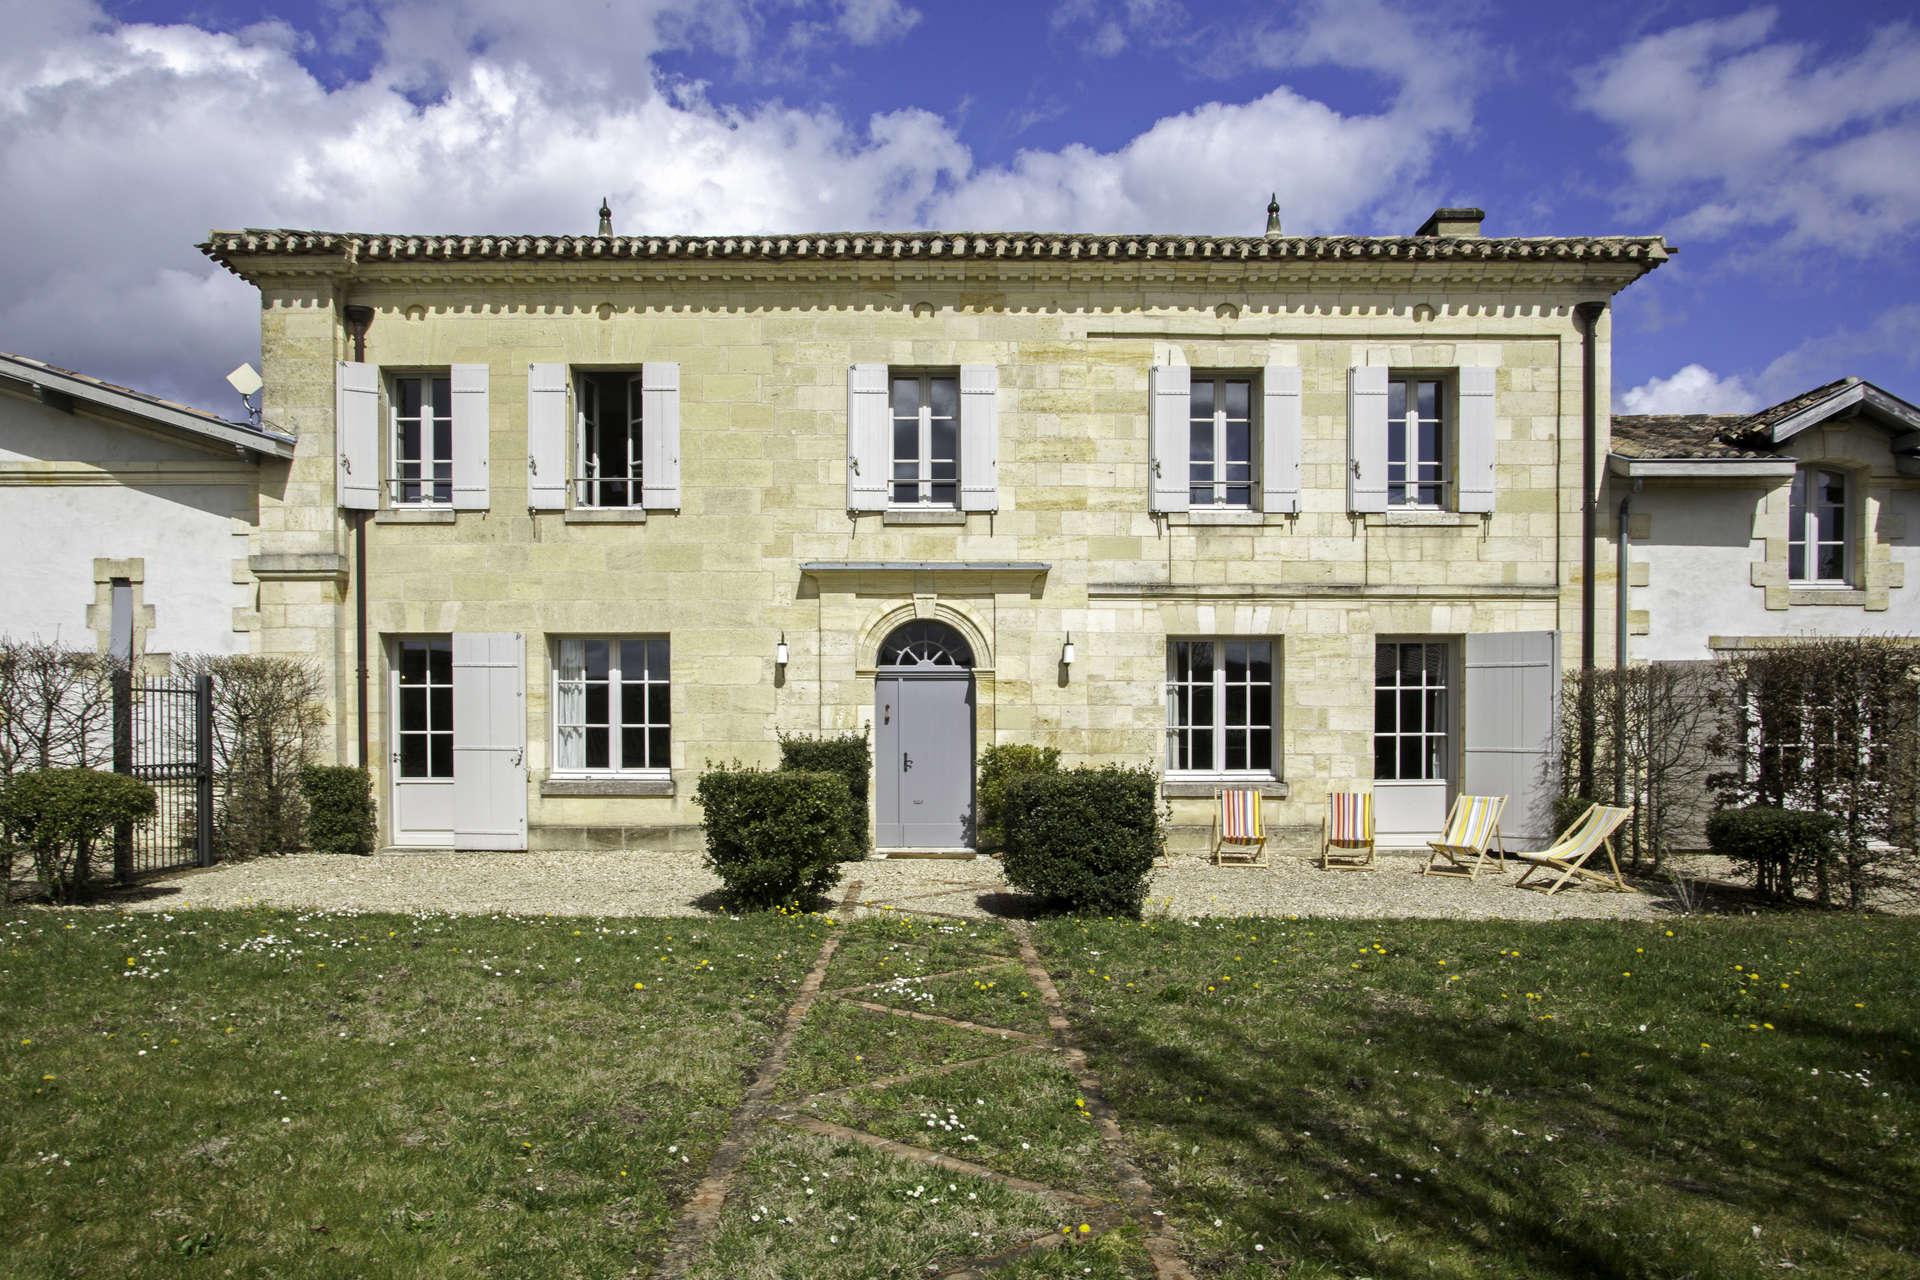 Luxury vacation rentals europe - France - Southwest france - Bord eaux - La Petite - Image 1/12